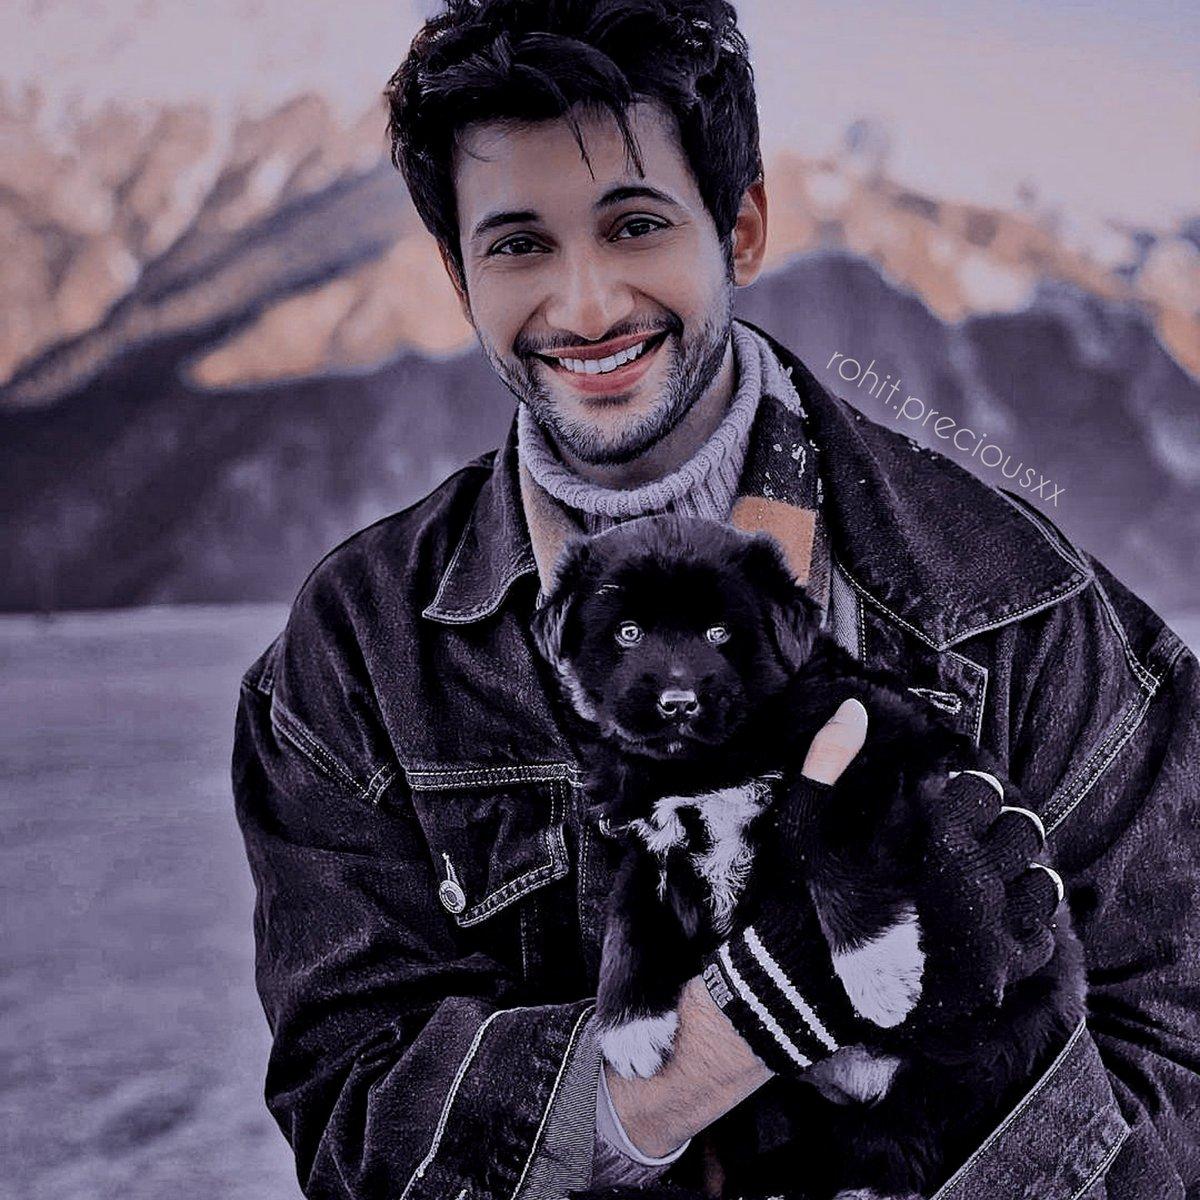 Aaaahhh 😭.... his smile is so precious ..my cutesttt bubb <3   #RohitSaraf mere friend bnoge??